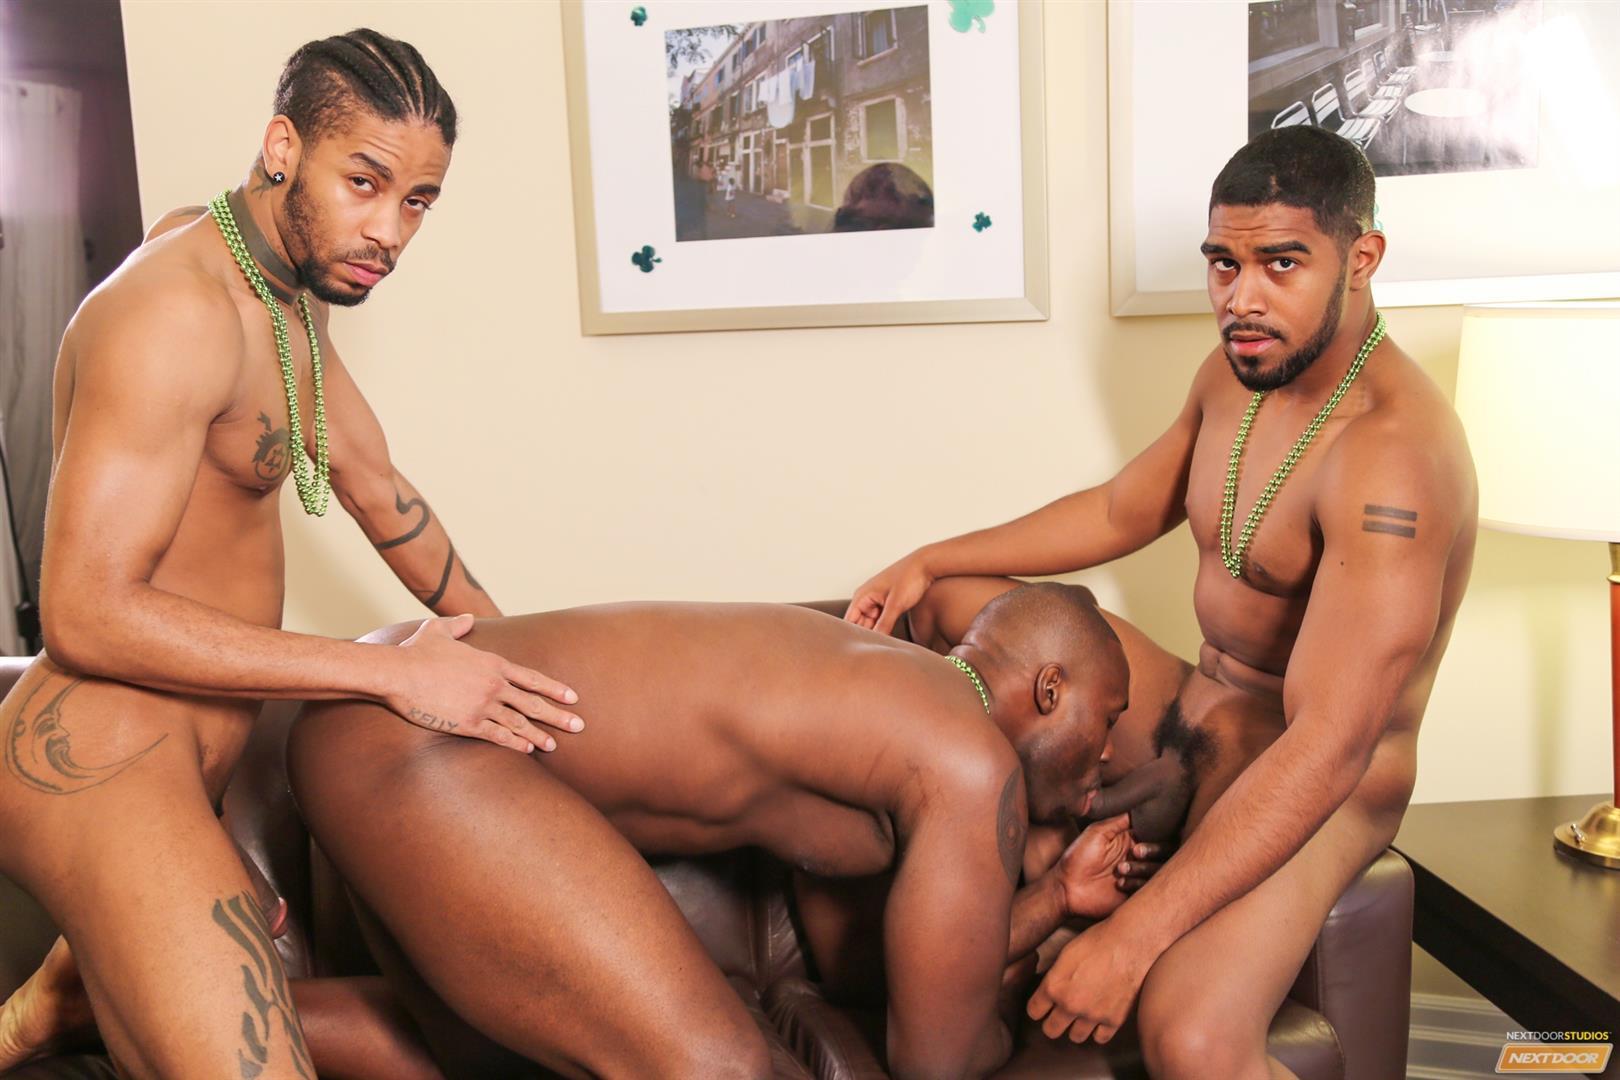 Next-Door-Ebony-Nubius-and-Jin-Powers-and-XL-Naked-Thugs-Threeway-Fucking-Amateur-Gay-Porn-11 Big Black Cock Threeway Suck and Fuck Thug Fest